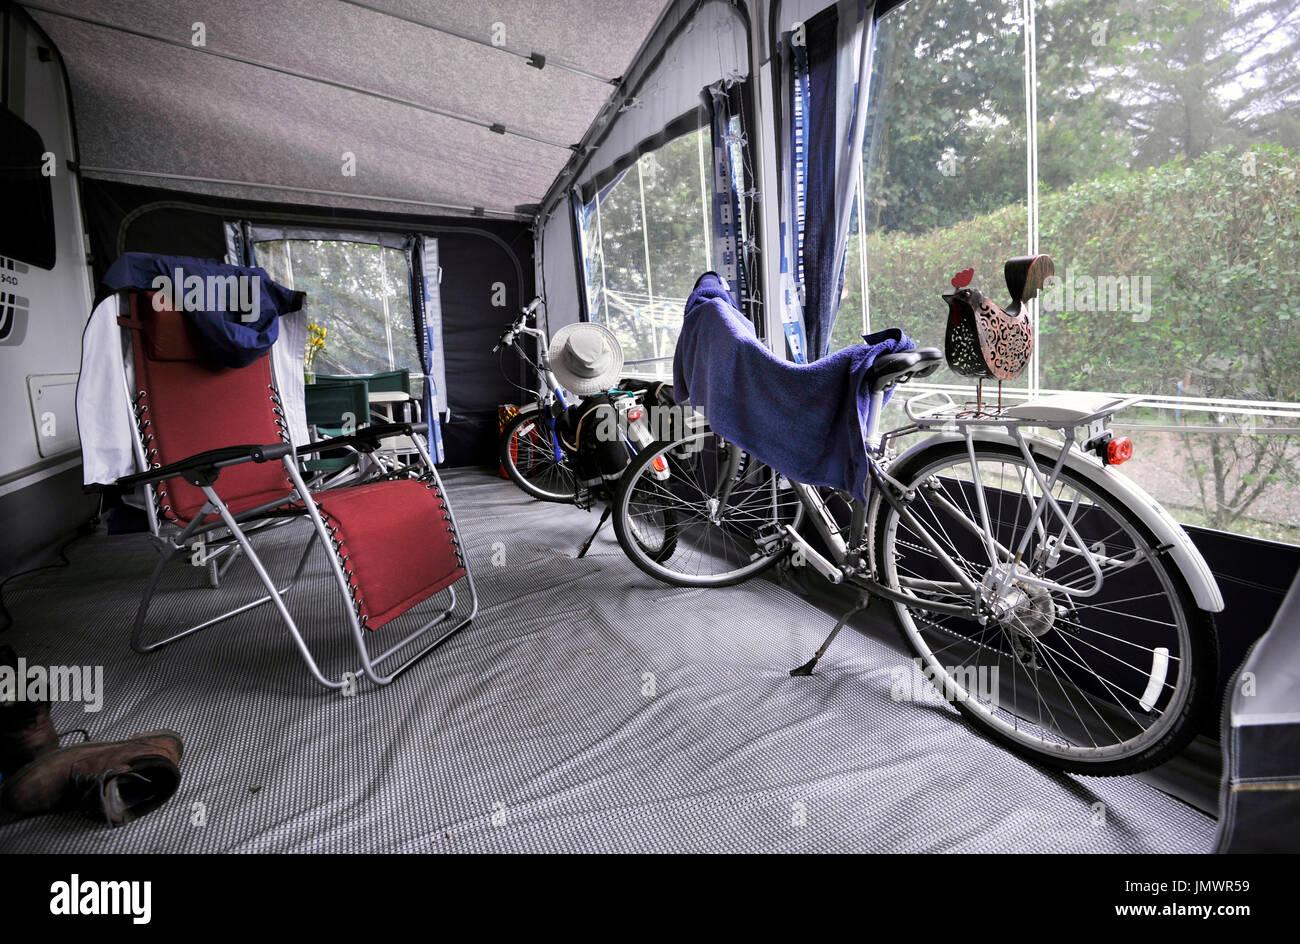 bikes stored inside caravan awning - Stock Image